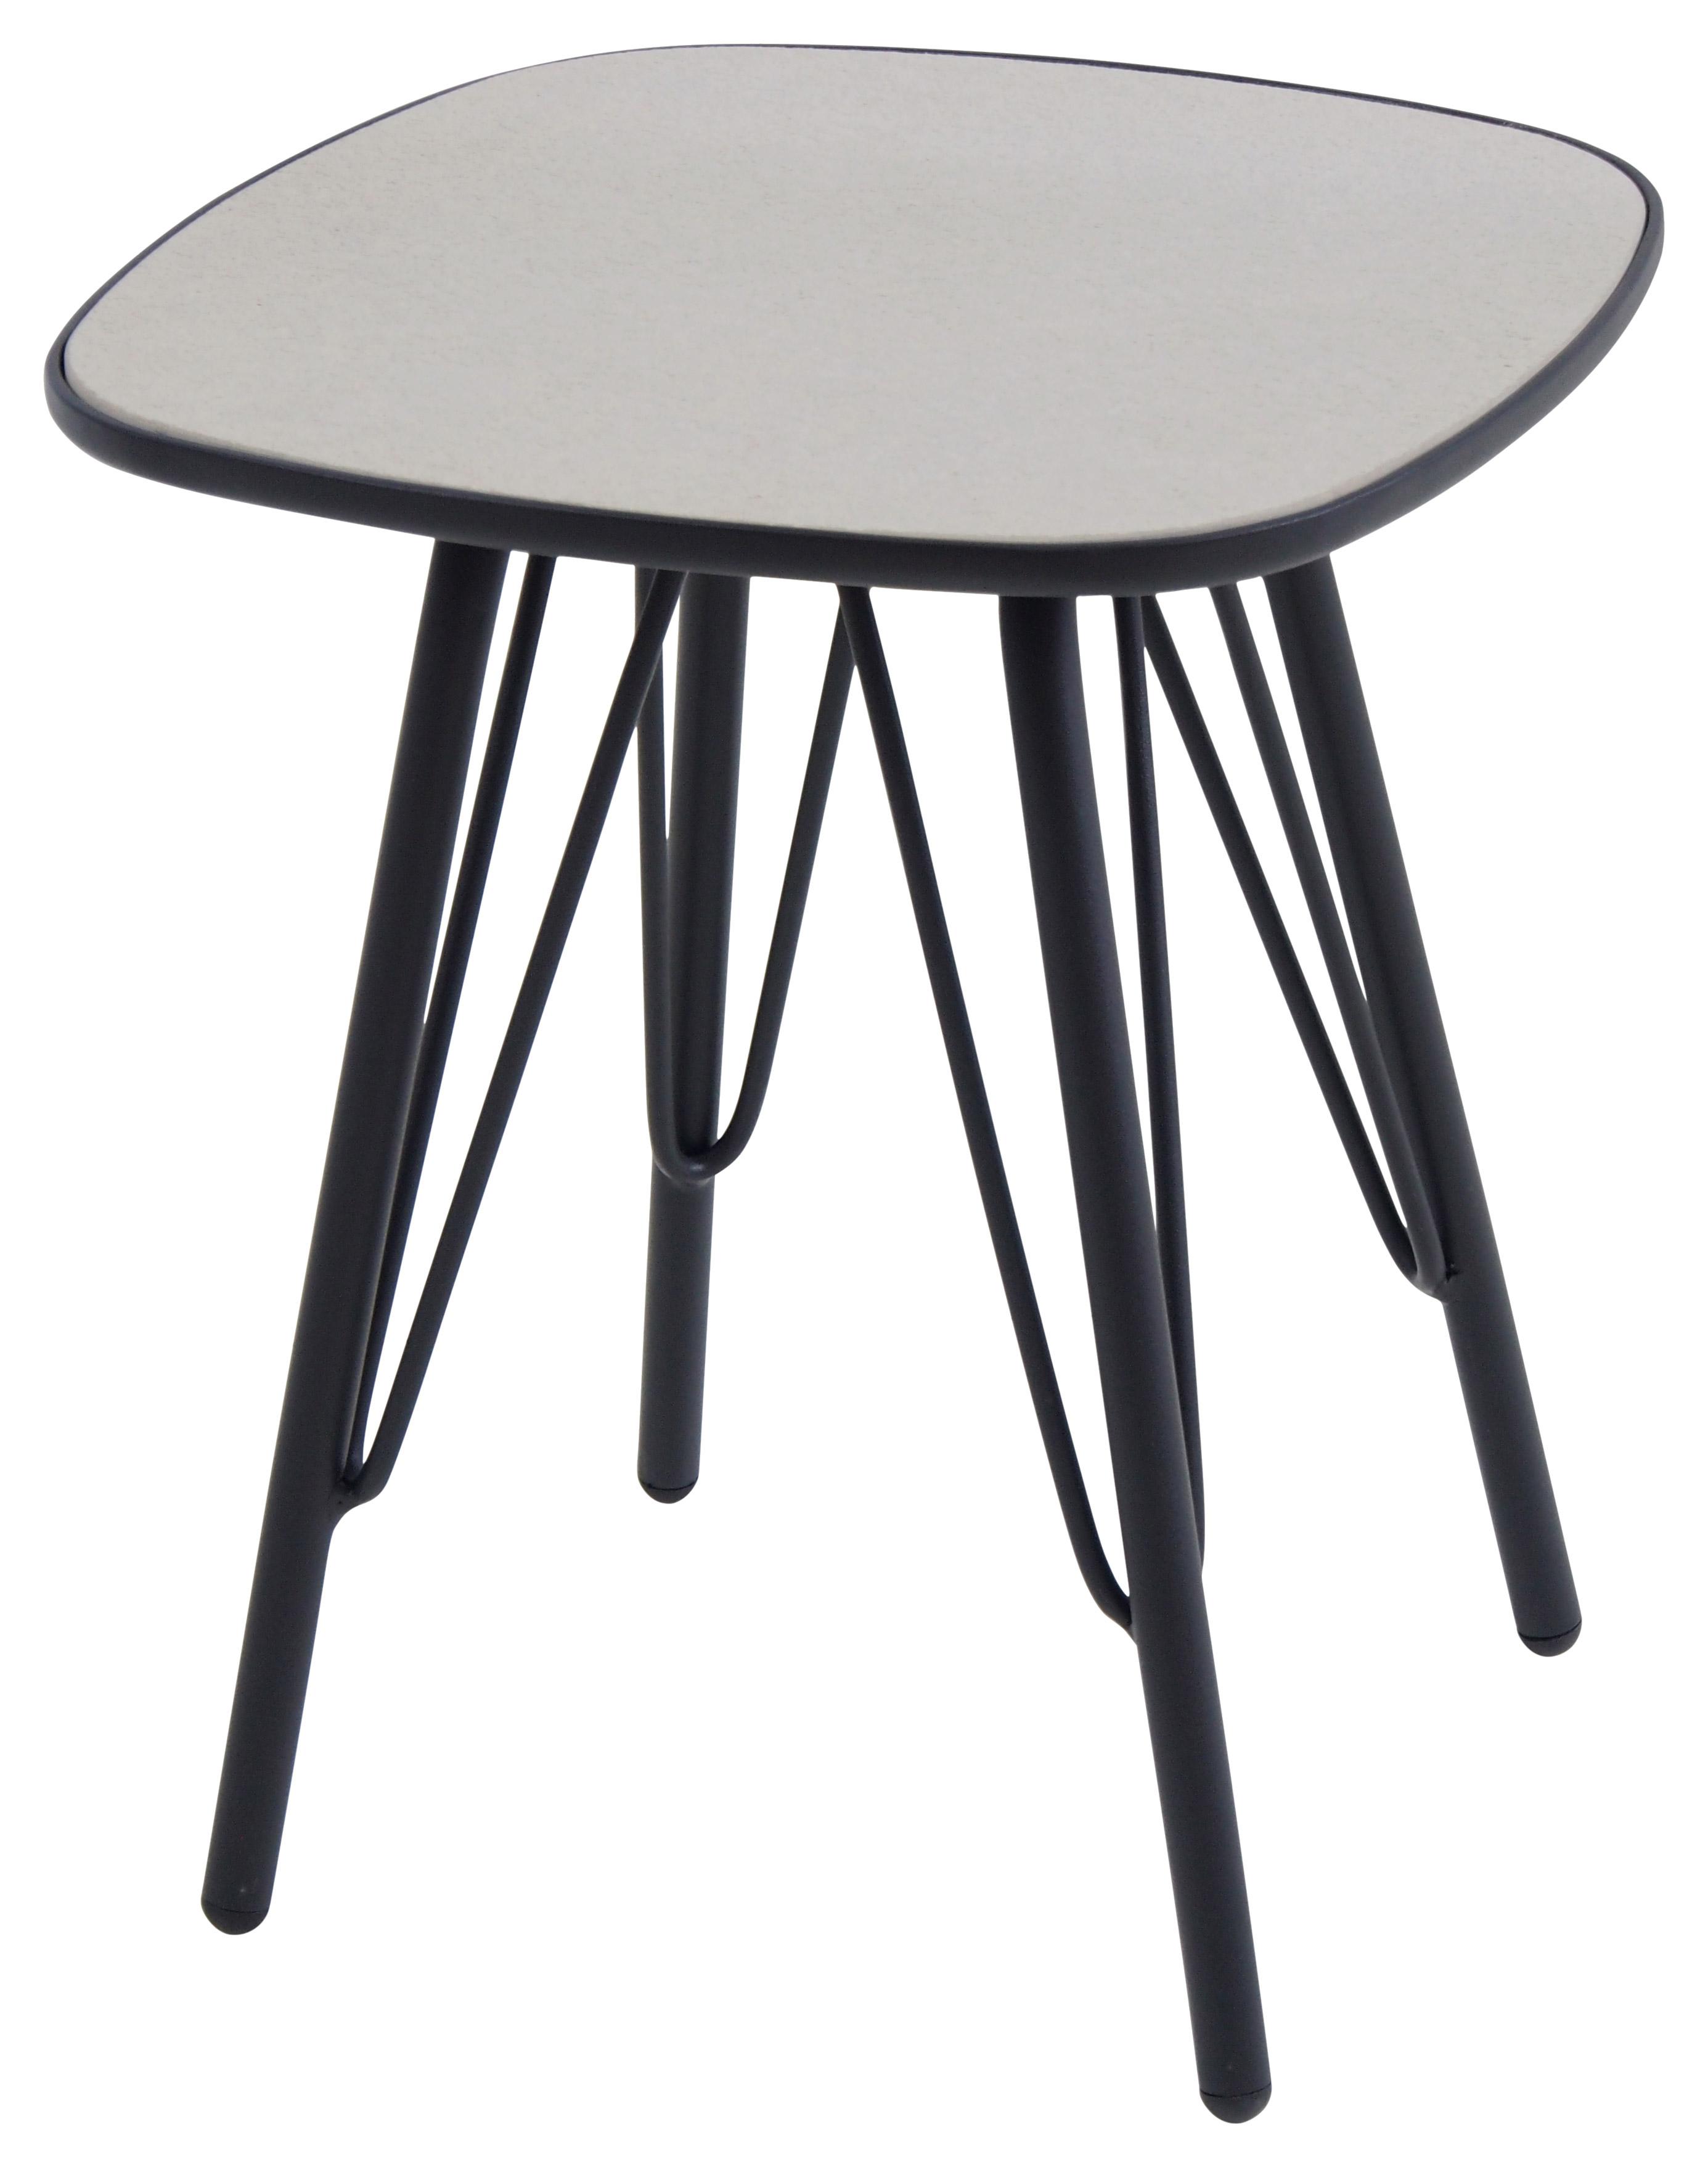 emuamericas, llc 624 sofa seating low table, outdoor